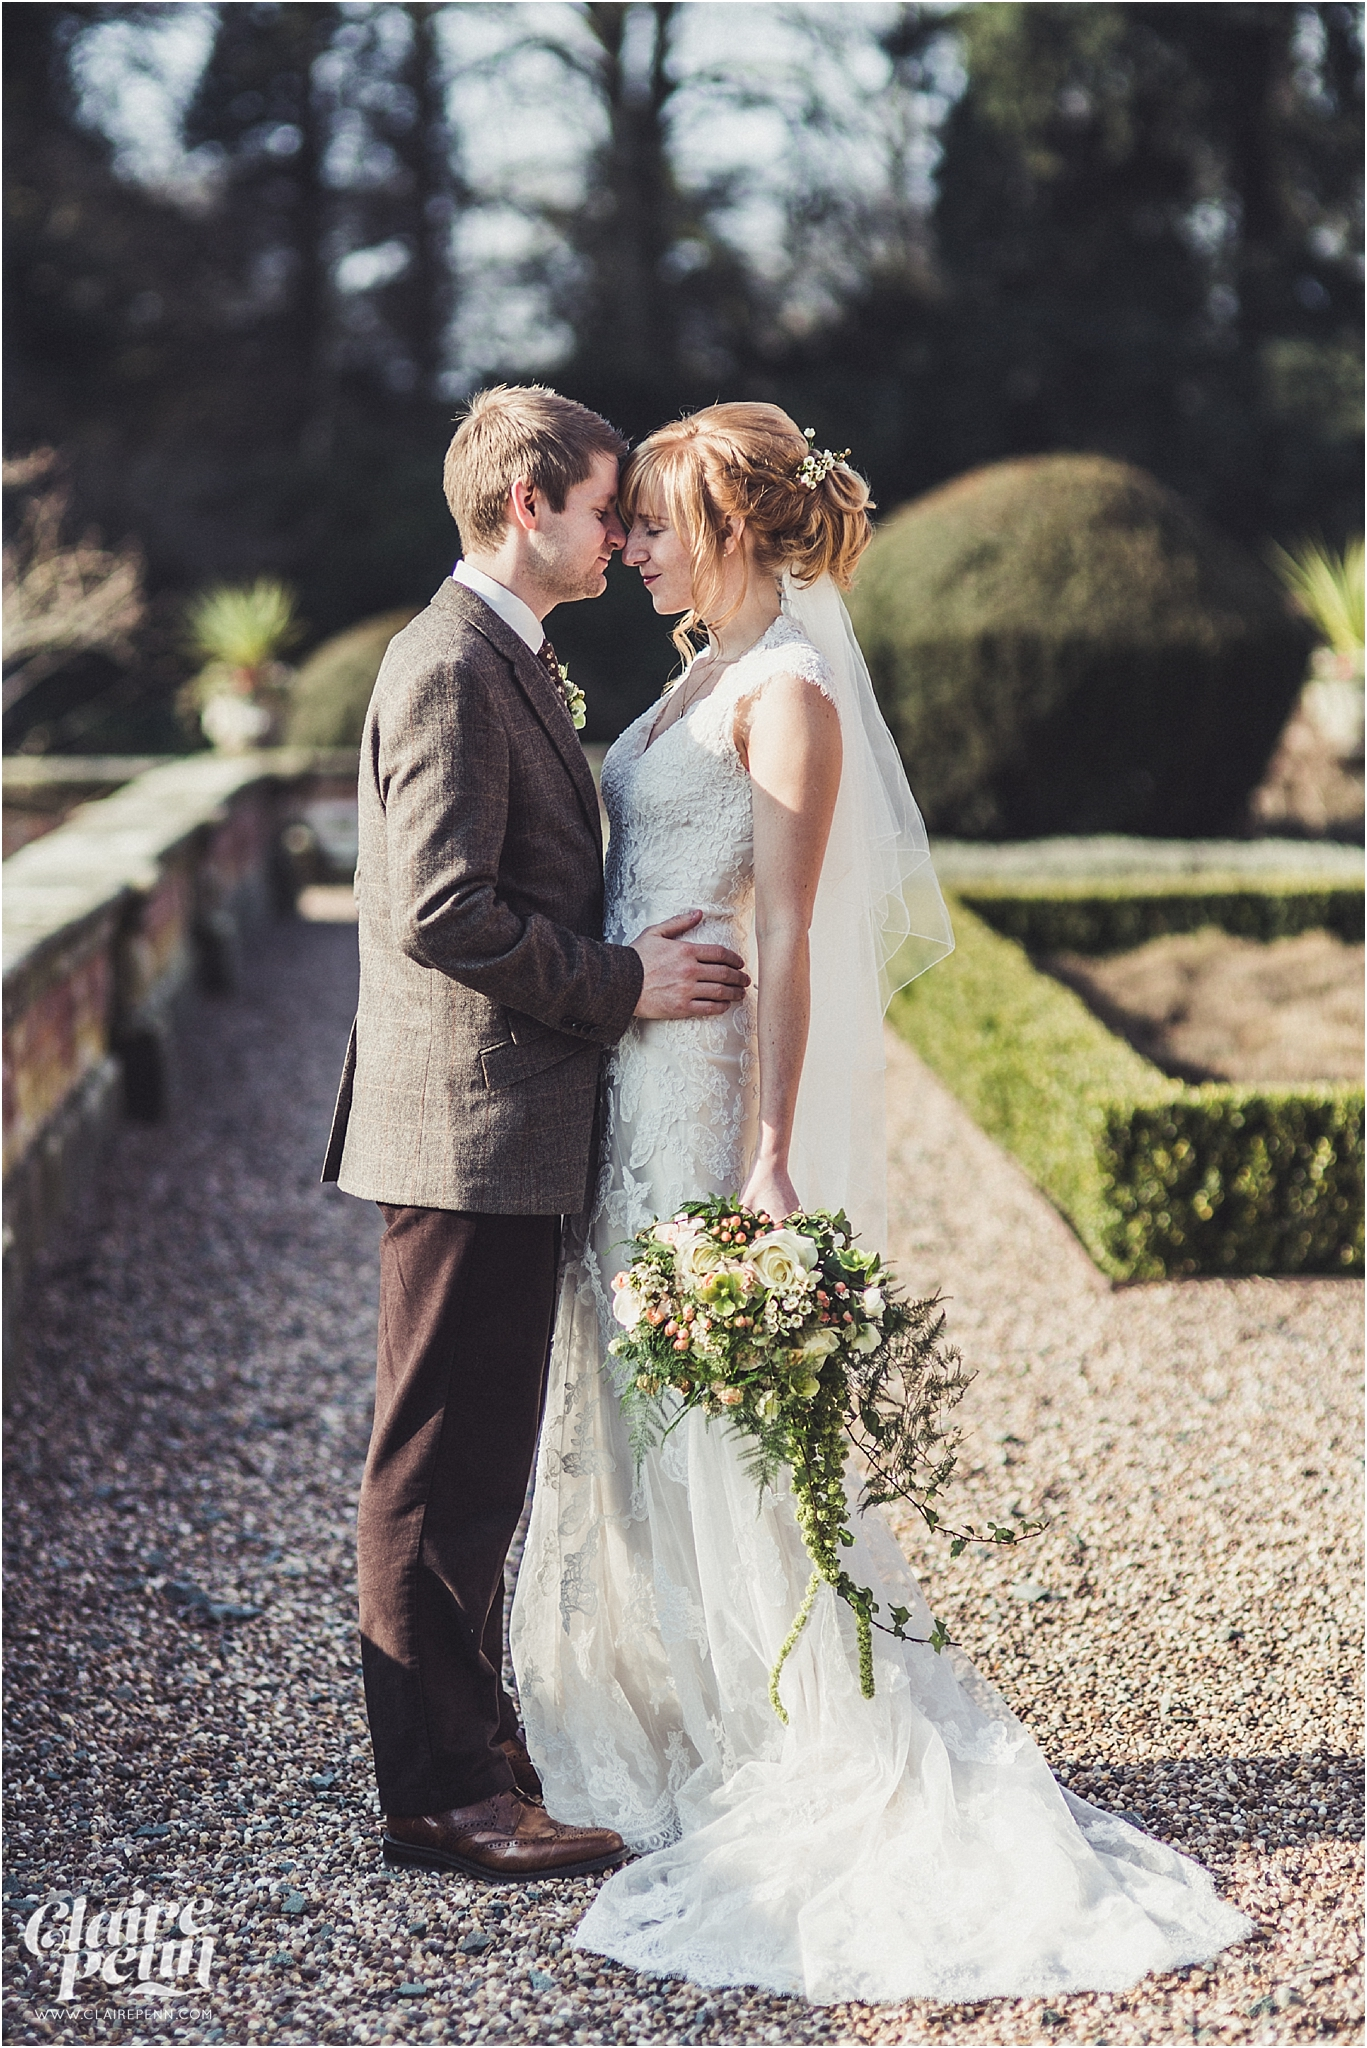 Iscoyd Park wedding, Whitchurch, Cheshire wedding photographer_0032.jpg